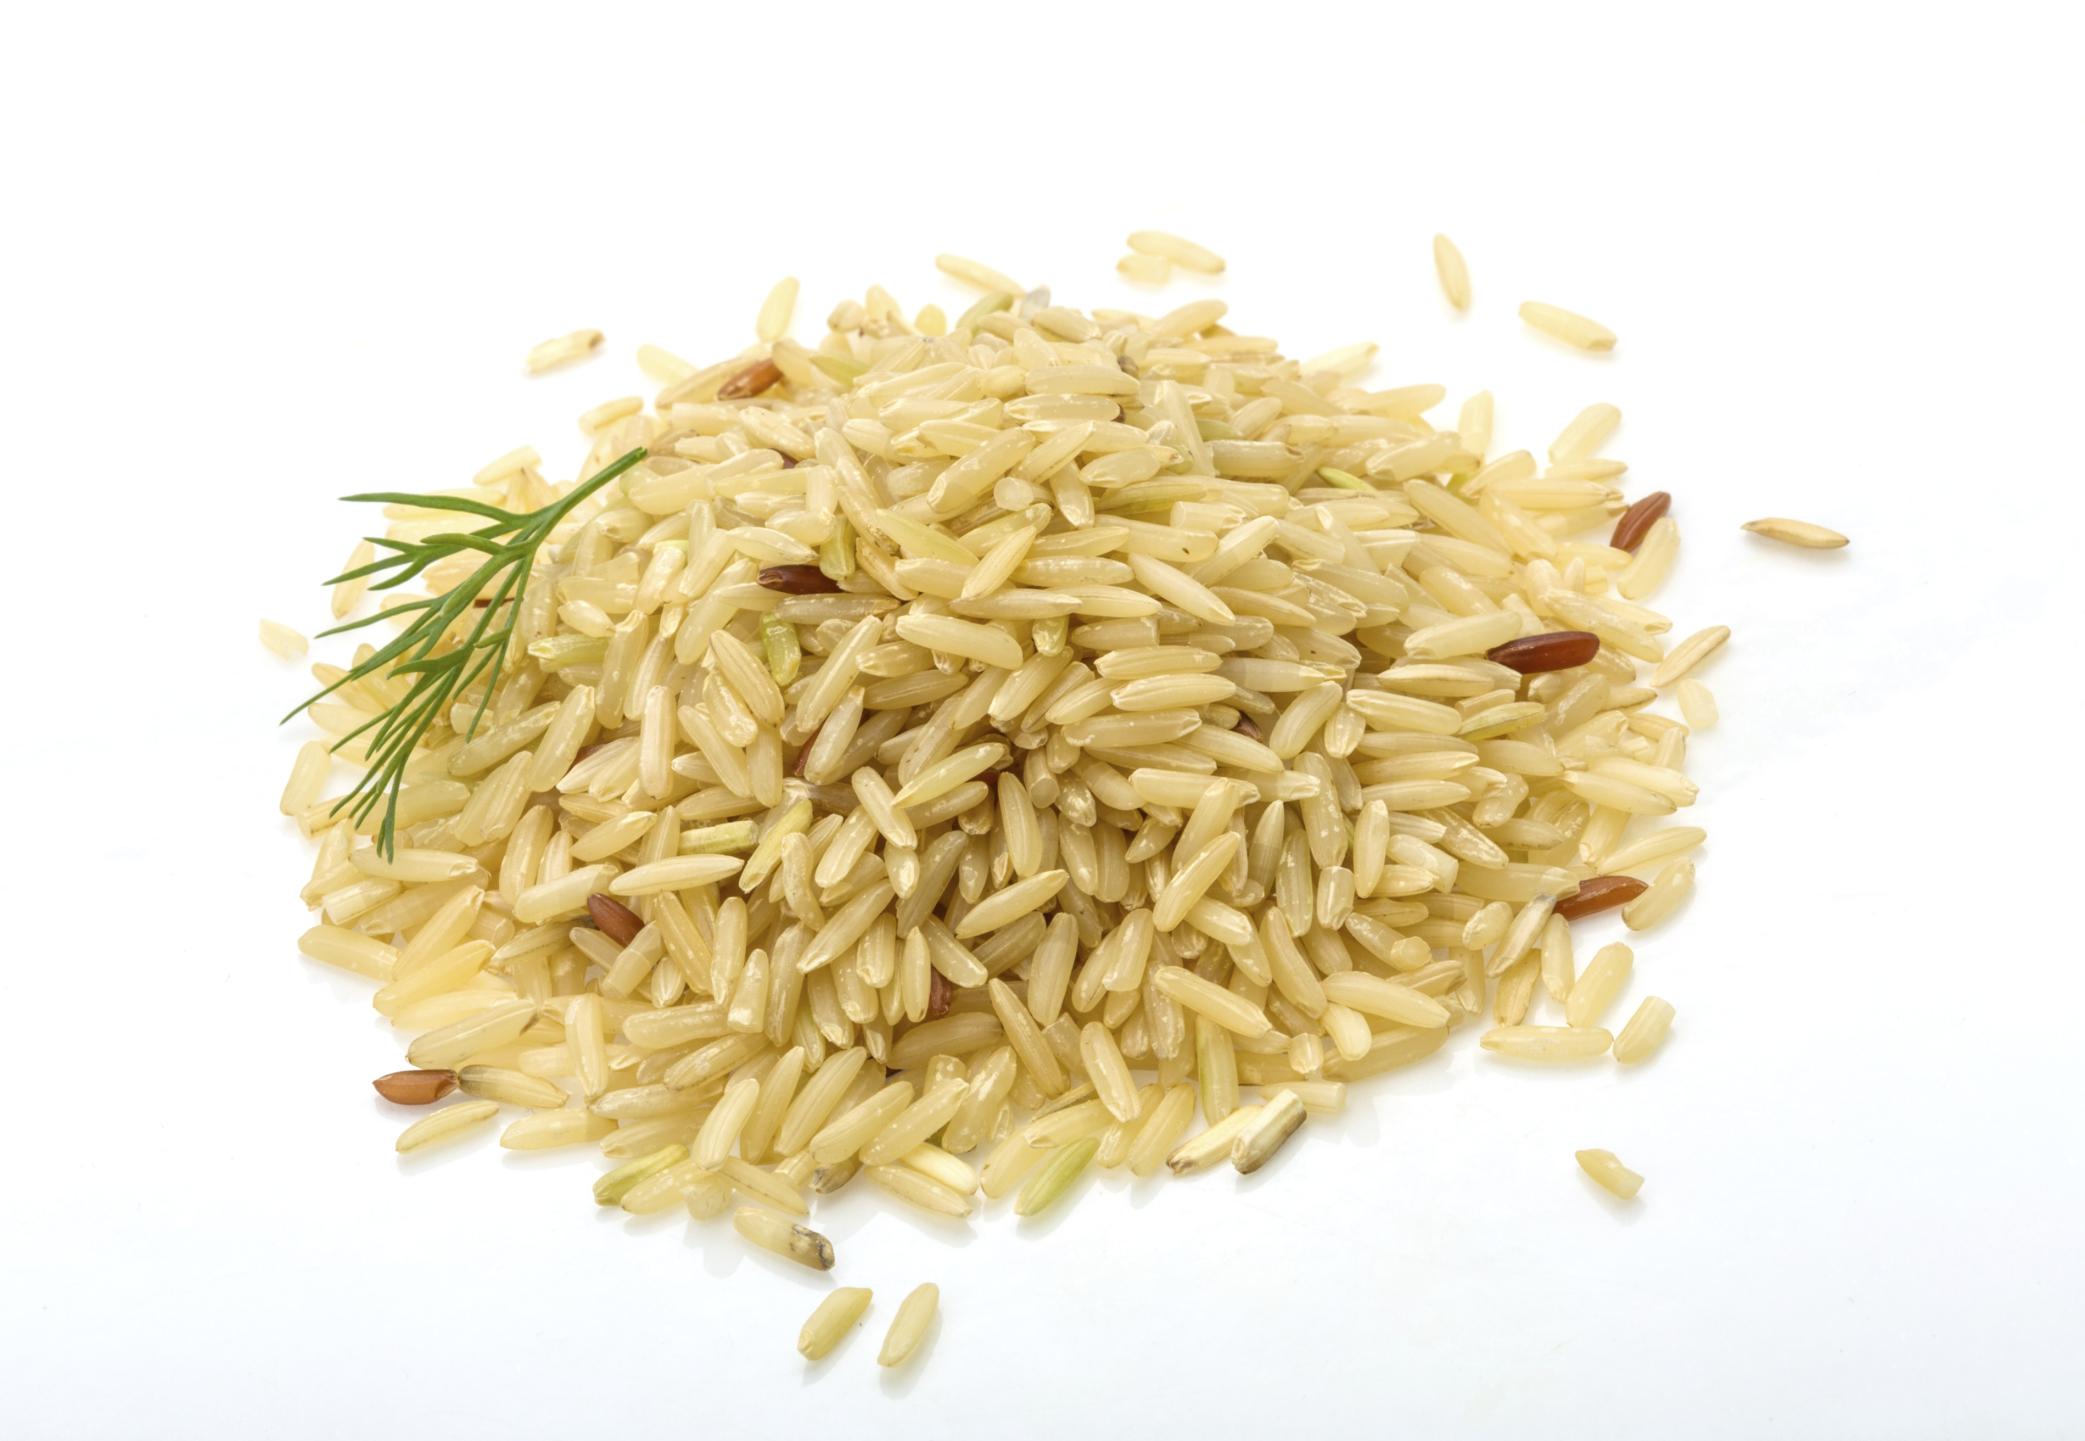 recipe: 50g uncooked rice calories [23]